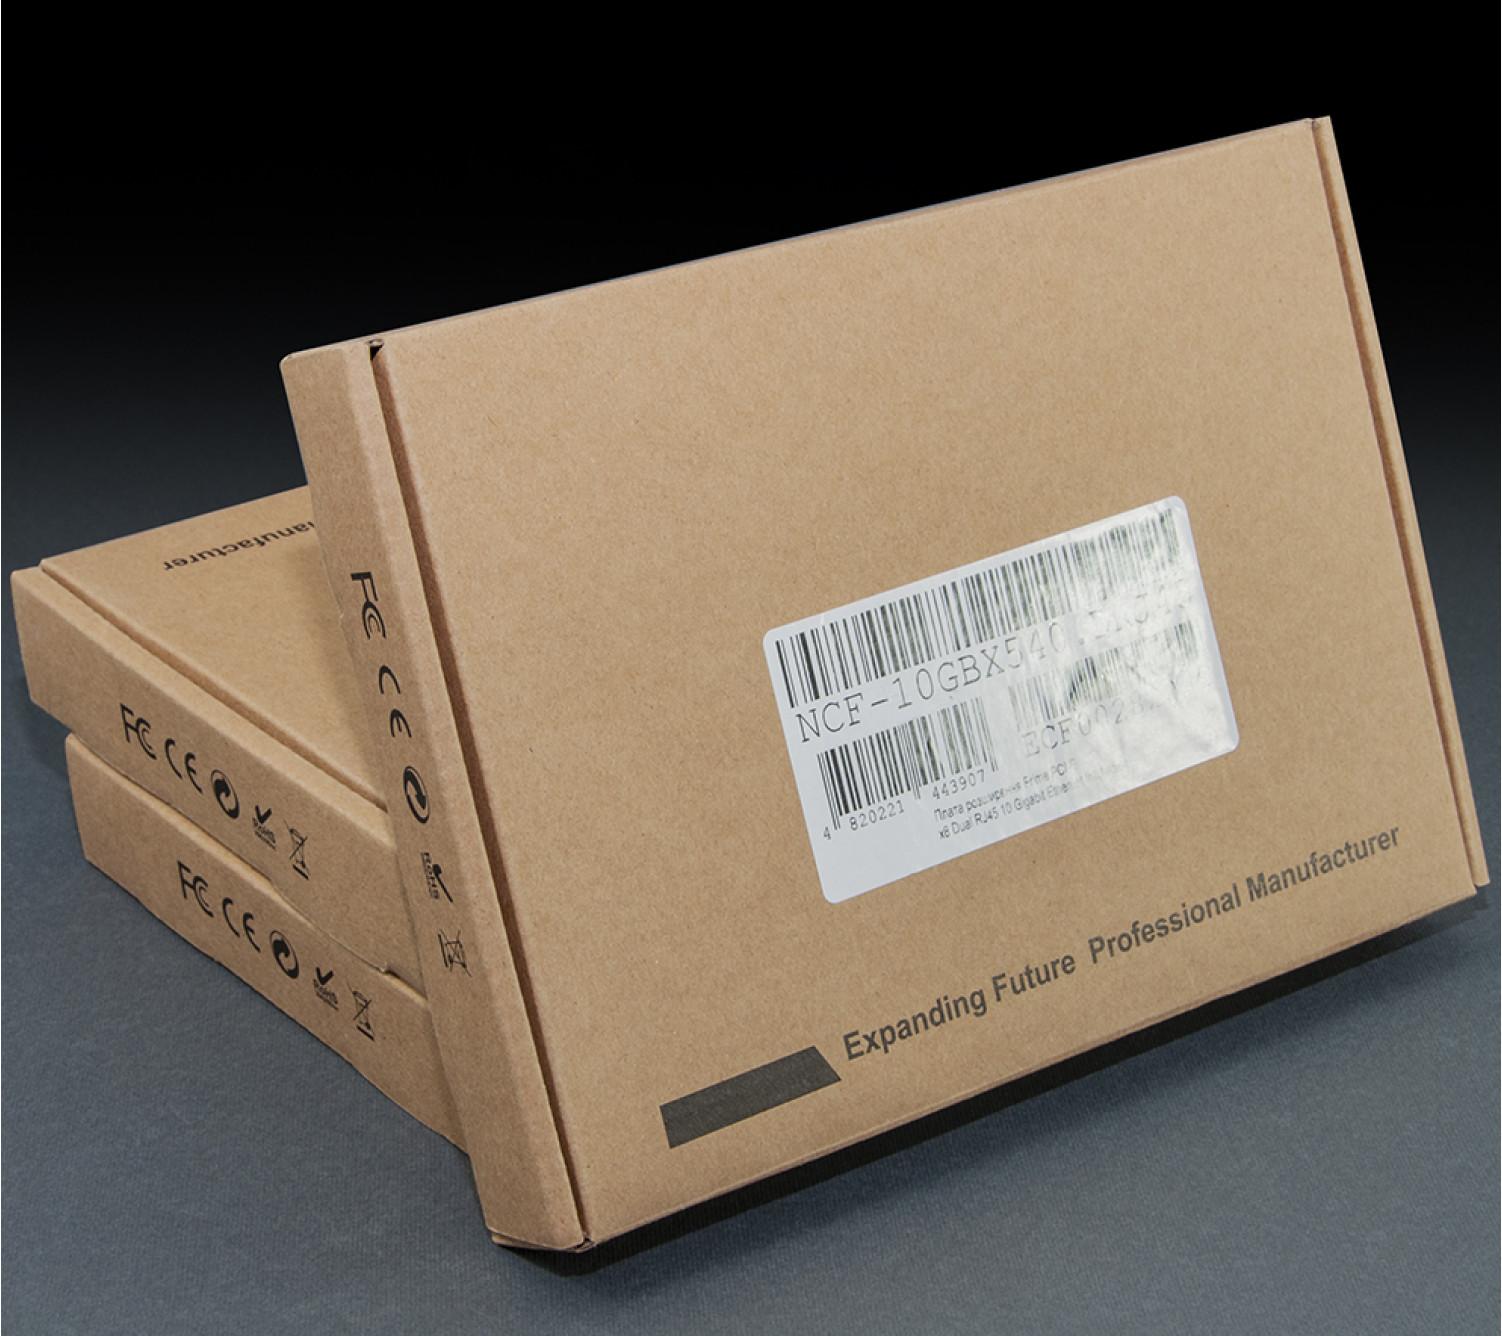 Сетевая карта Frime PCI-E x8 Dual RJ45 10 Gigabit Ethernet Intel X540 (NCF-10GbX540.DRJ45)